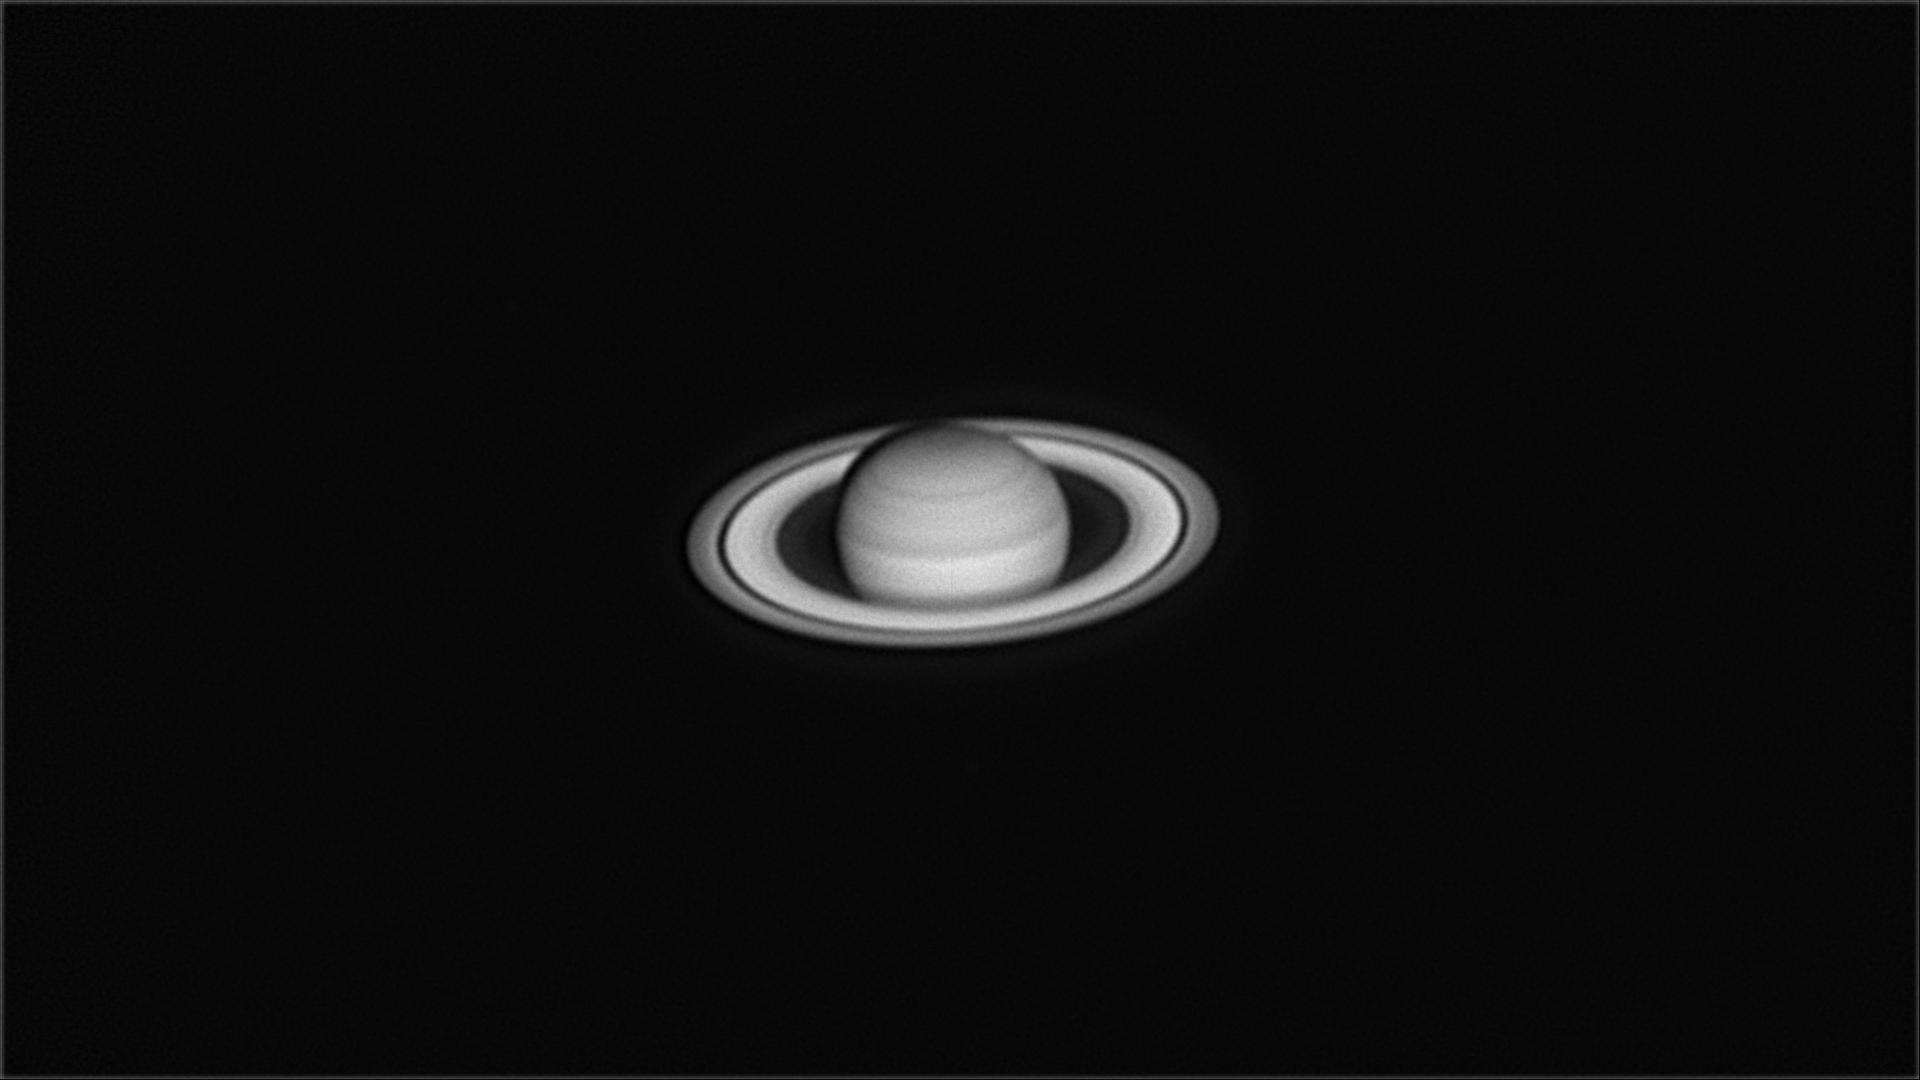 Saturne le 25 aout 2019 20h42TU